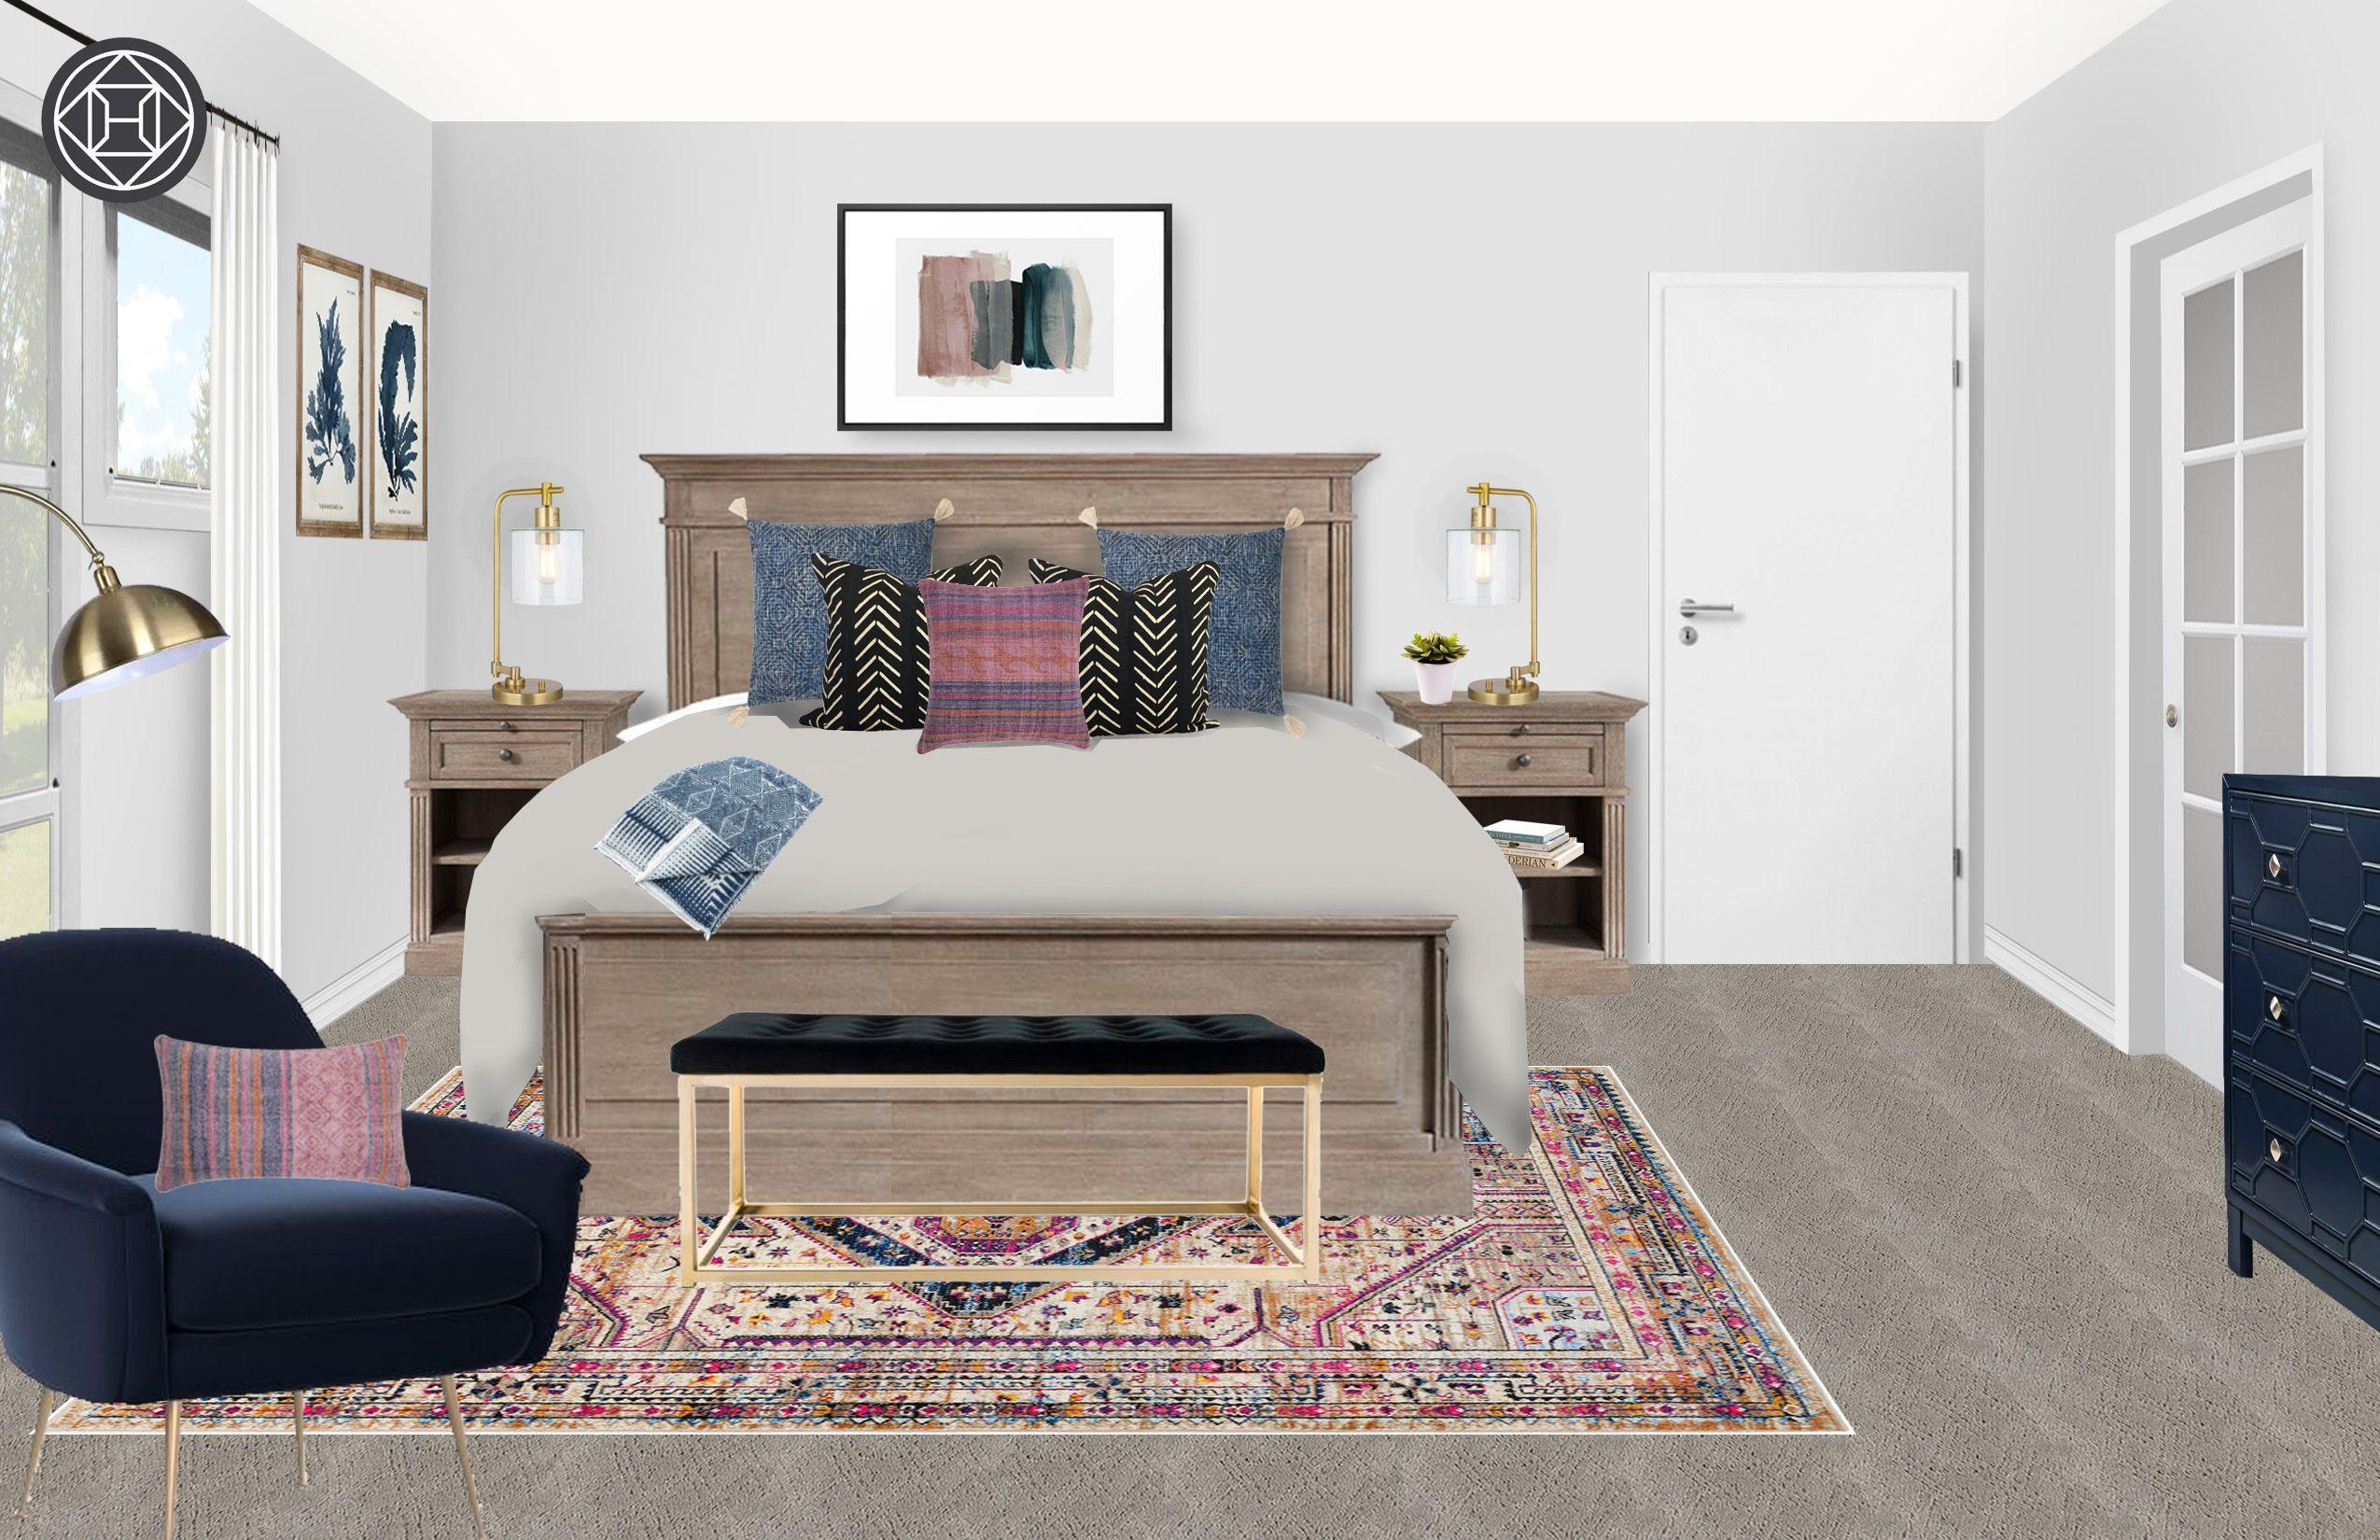 Bohemian Bedroom by Havenly   Bohemian bedroom design ...